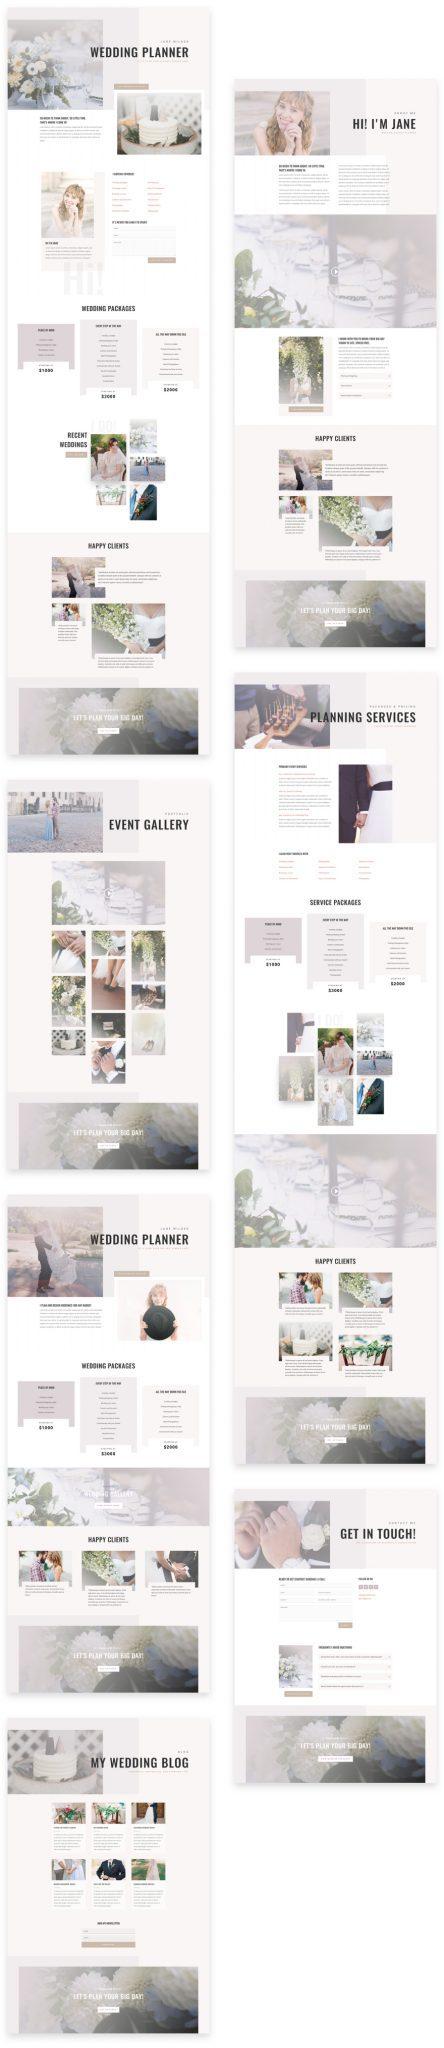 Wedding Planner Layout Pack